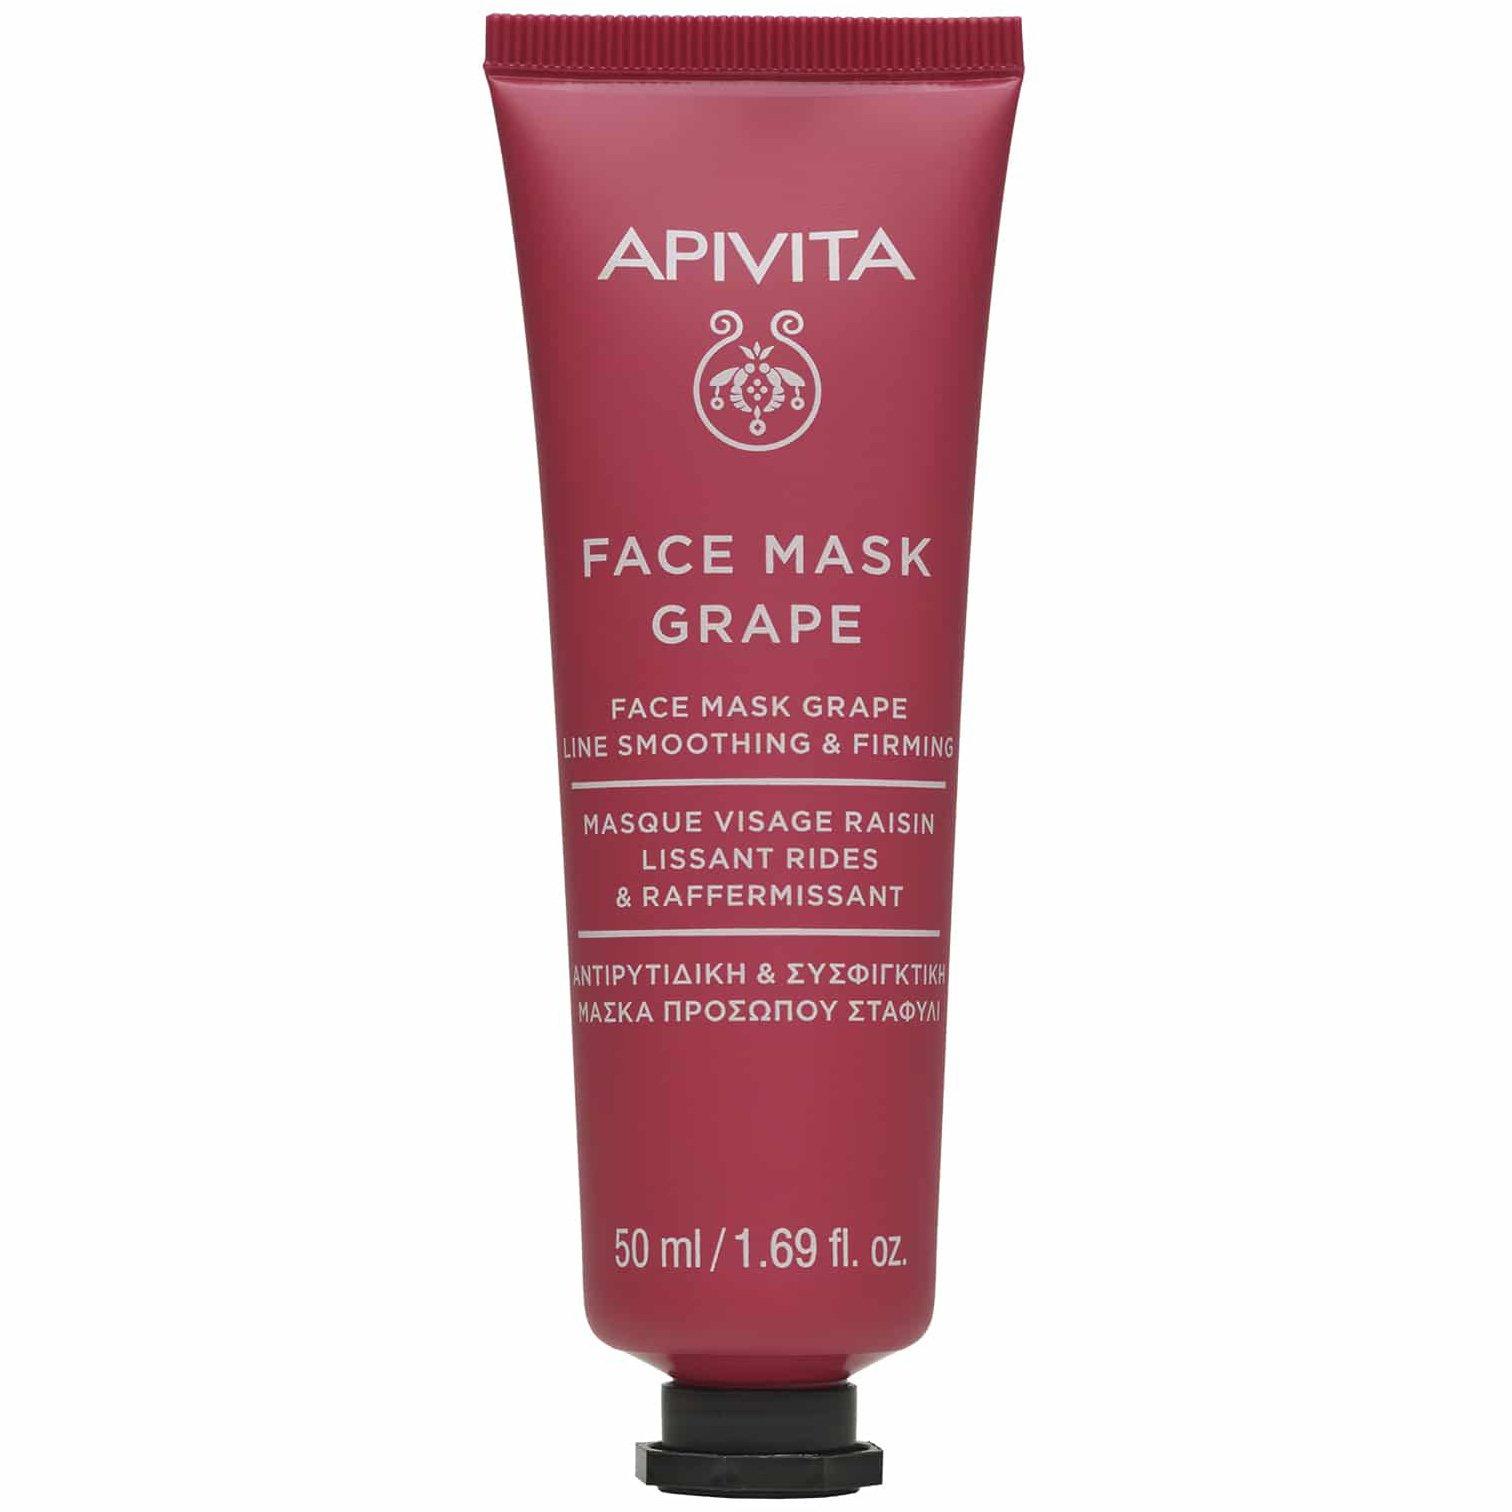 Apivita Face Mask With Grape Αντιρυτιδική & Συσφικτική Μάσκα Προσώπου με Σταφύλι 50ml